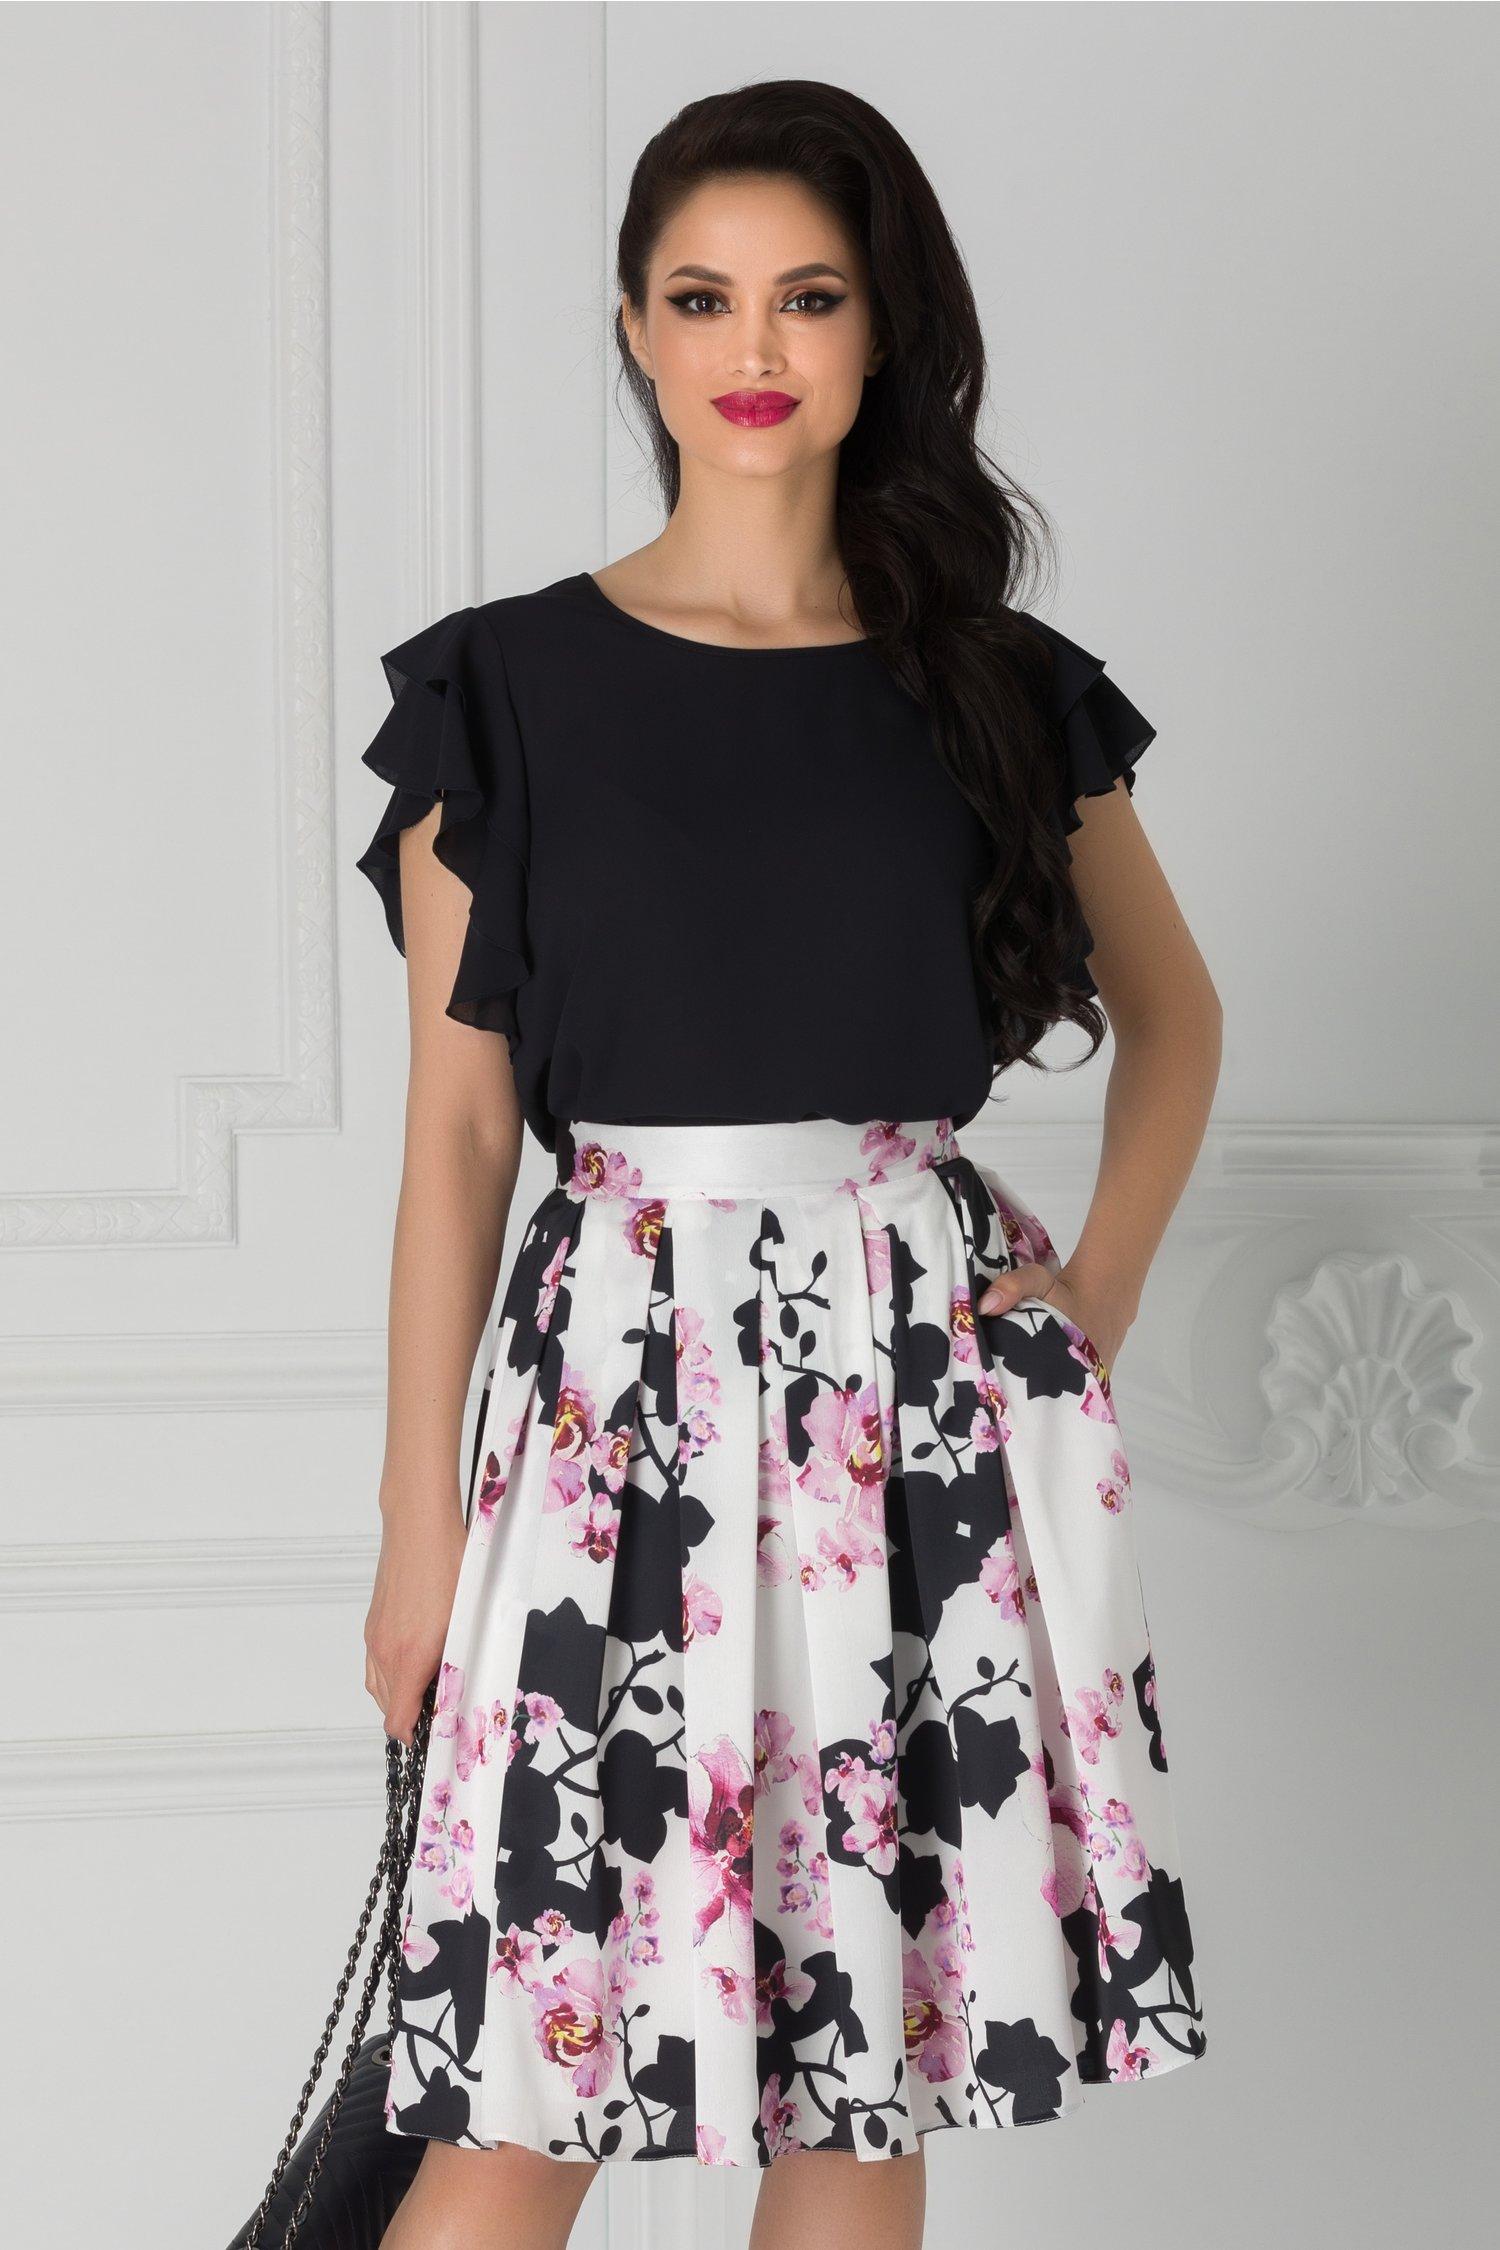 Fusta clos alba cu imprimeu floral roz si negru